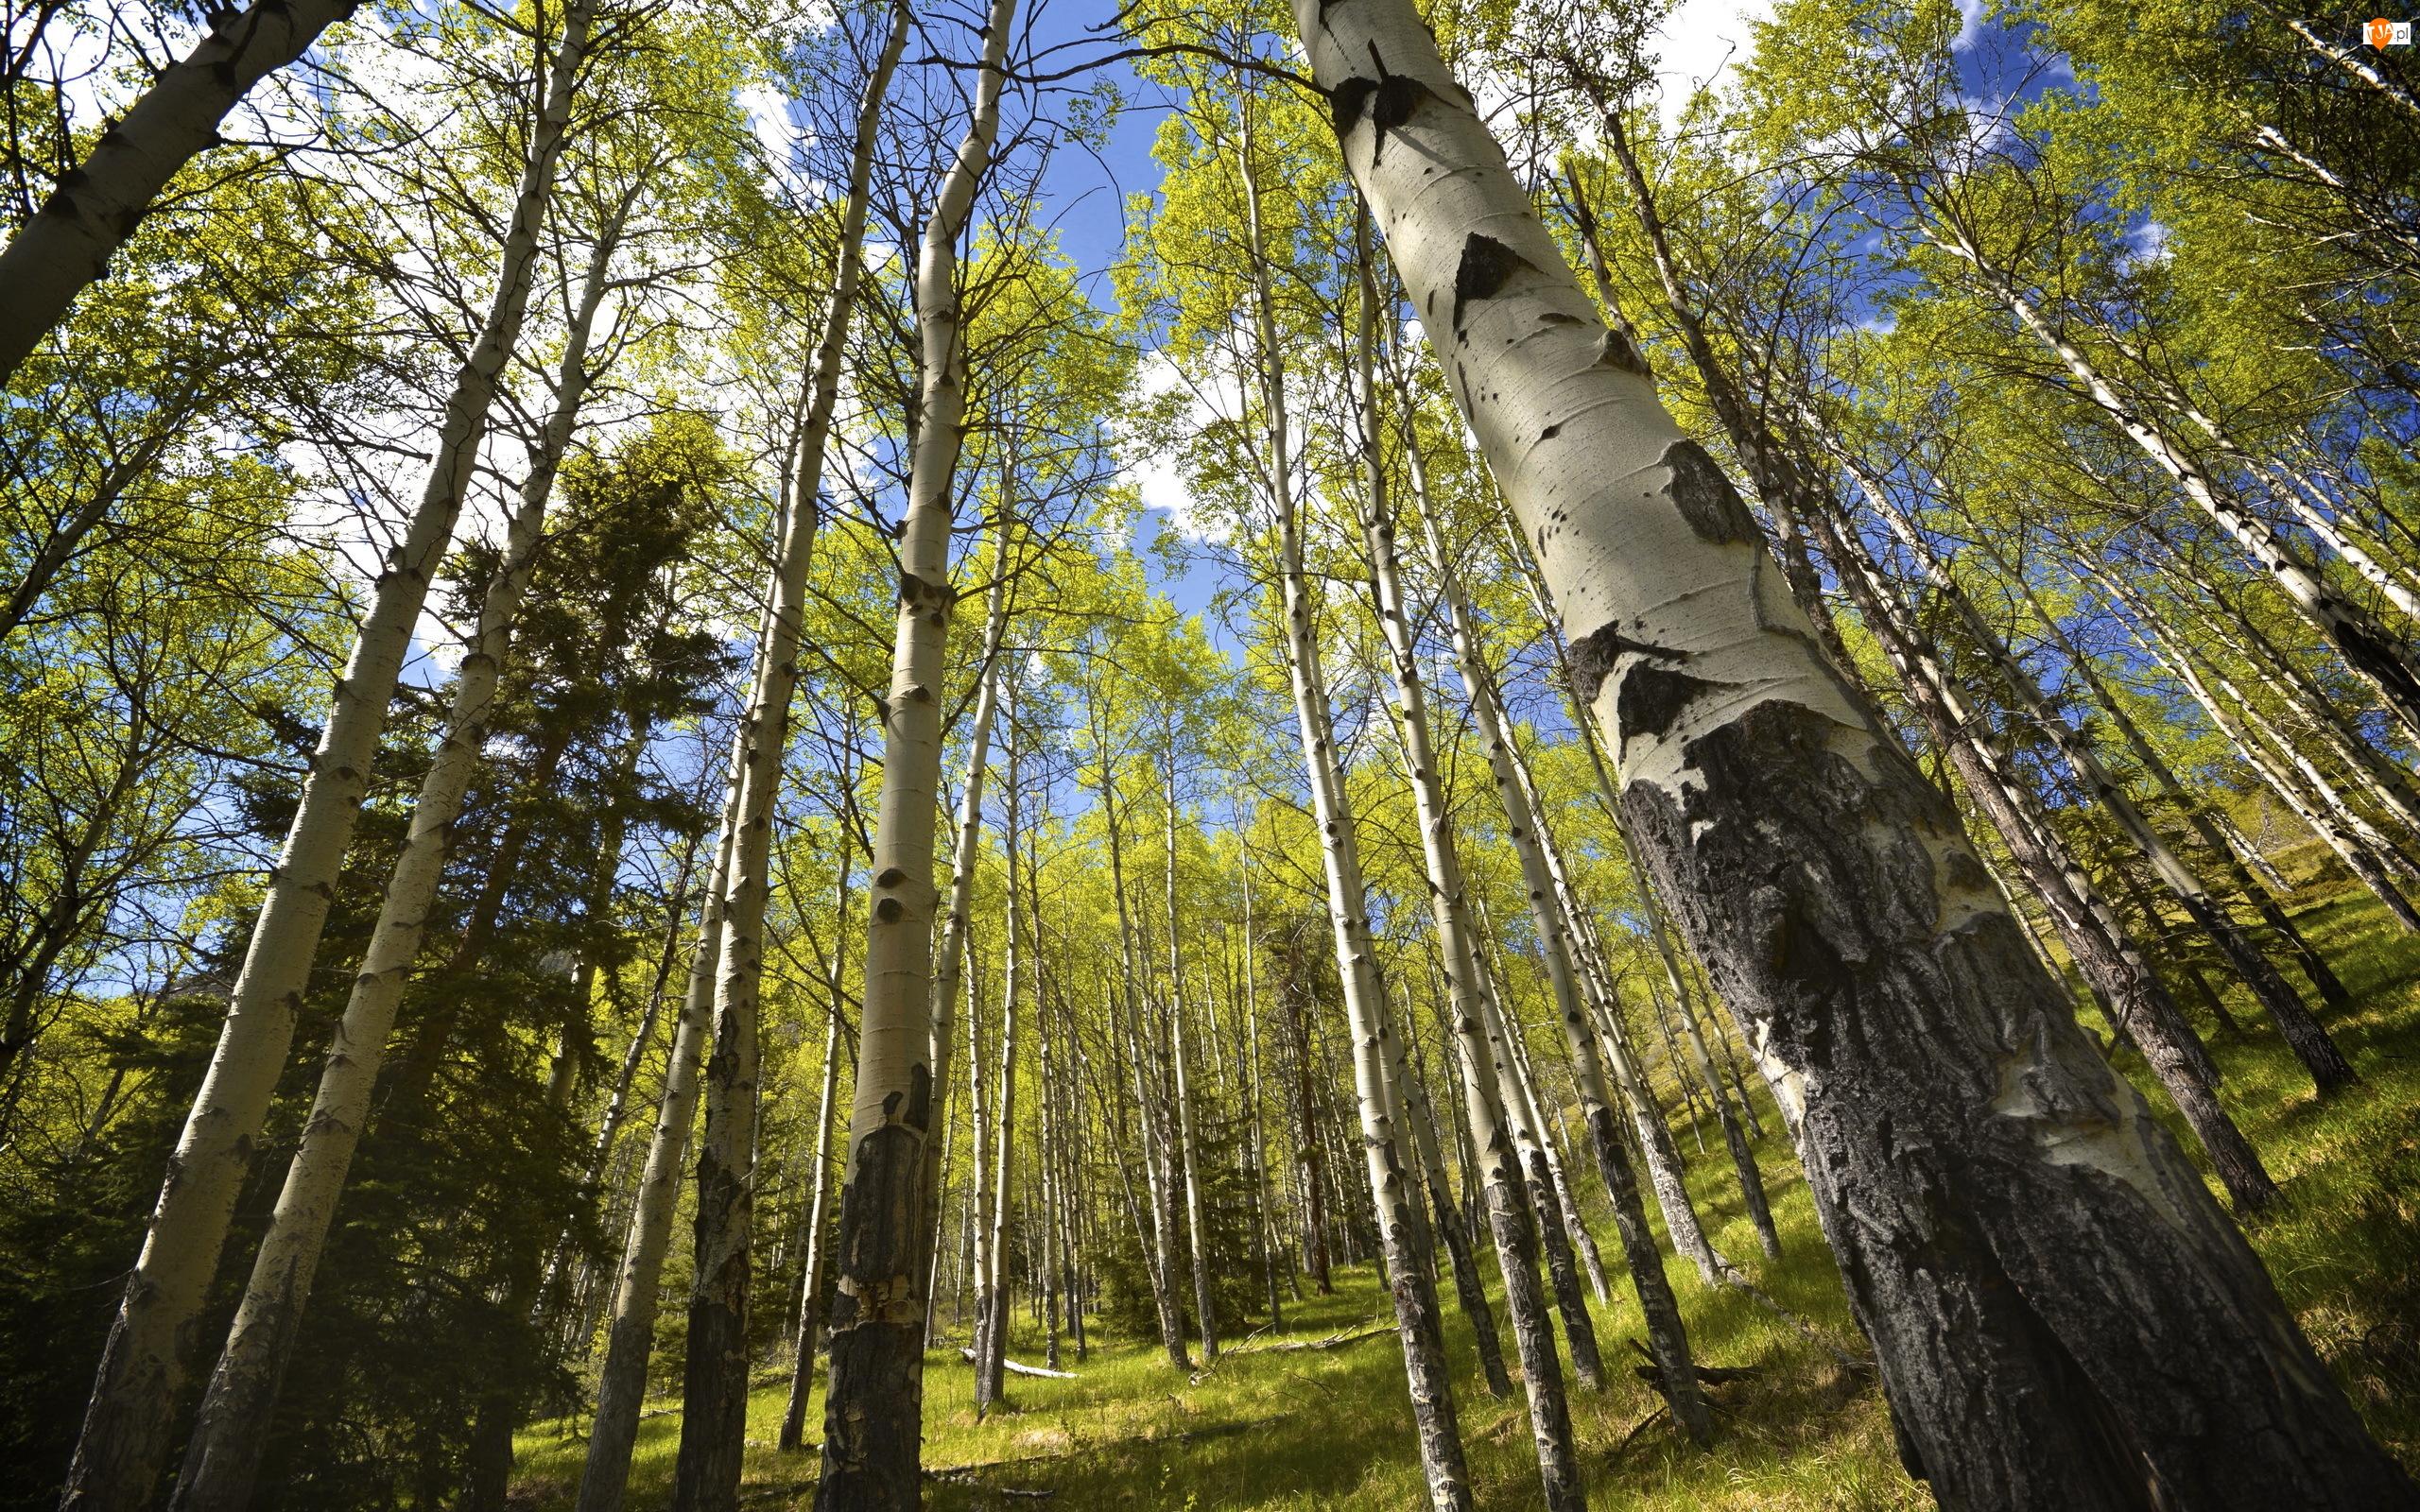 Topole osikowe, Las, Drzewa